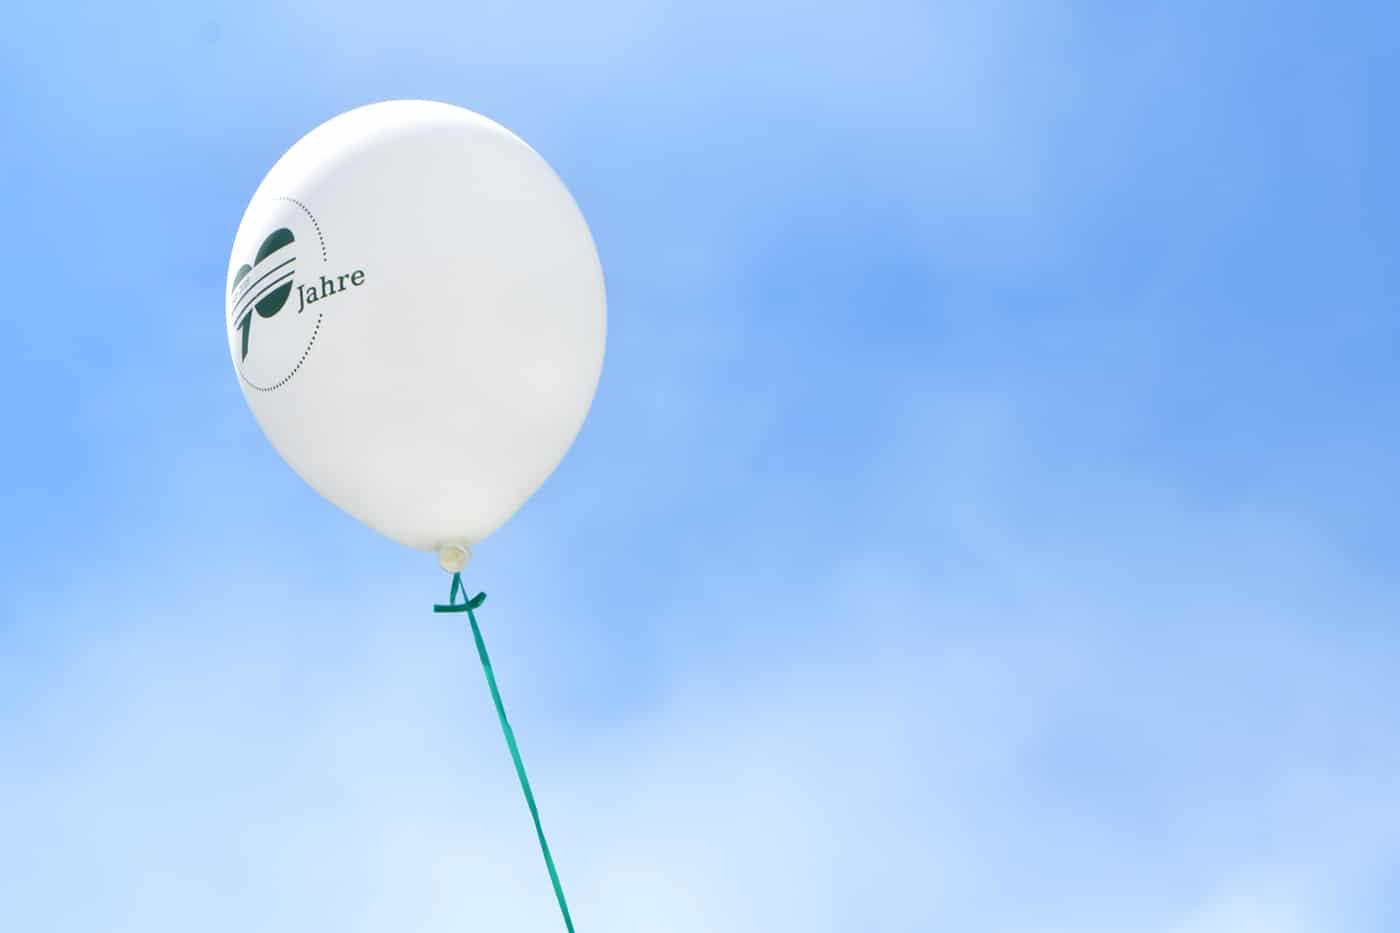 Luftballon mit 90-Jahre Logo